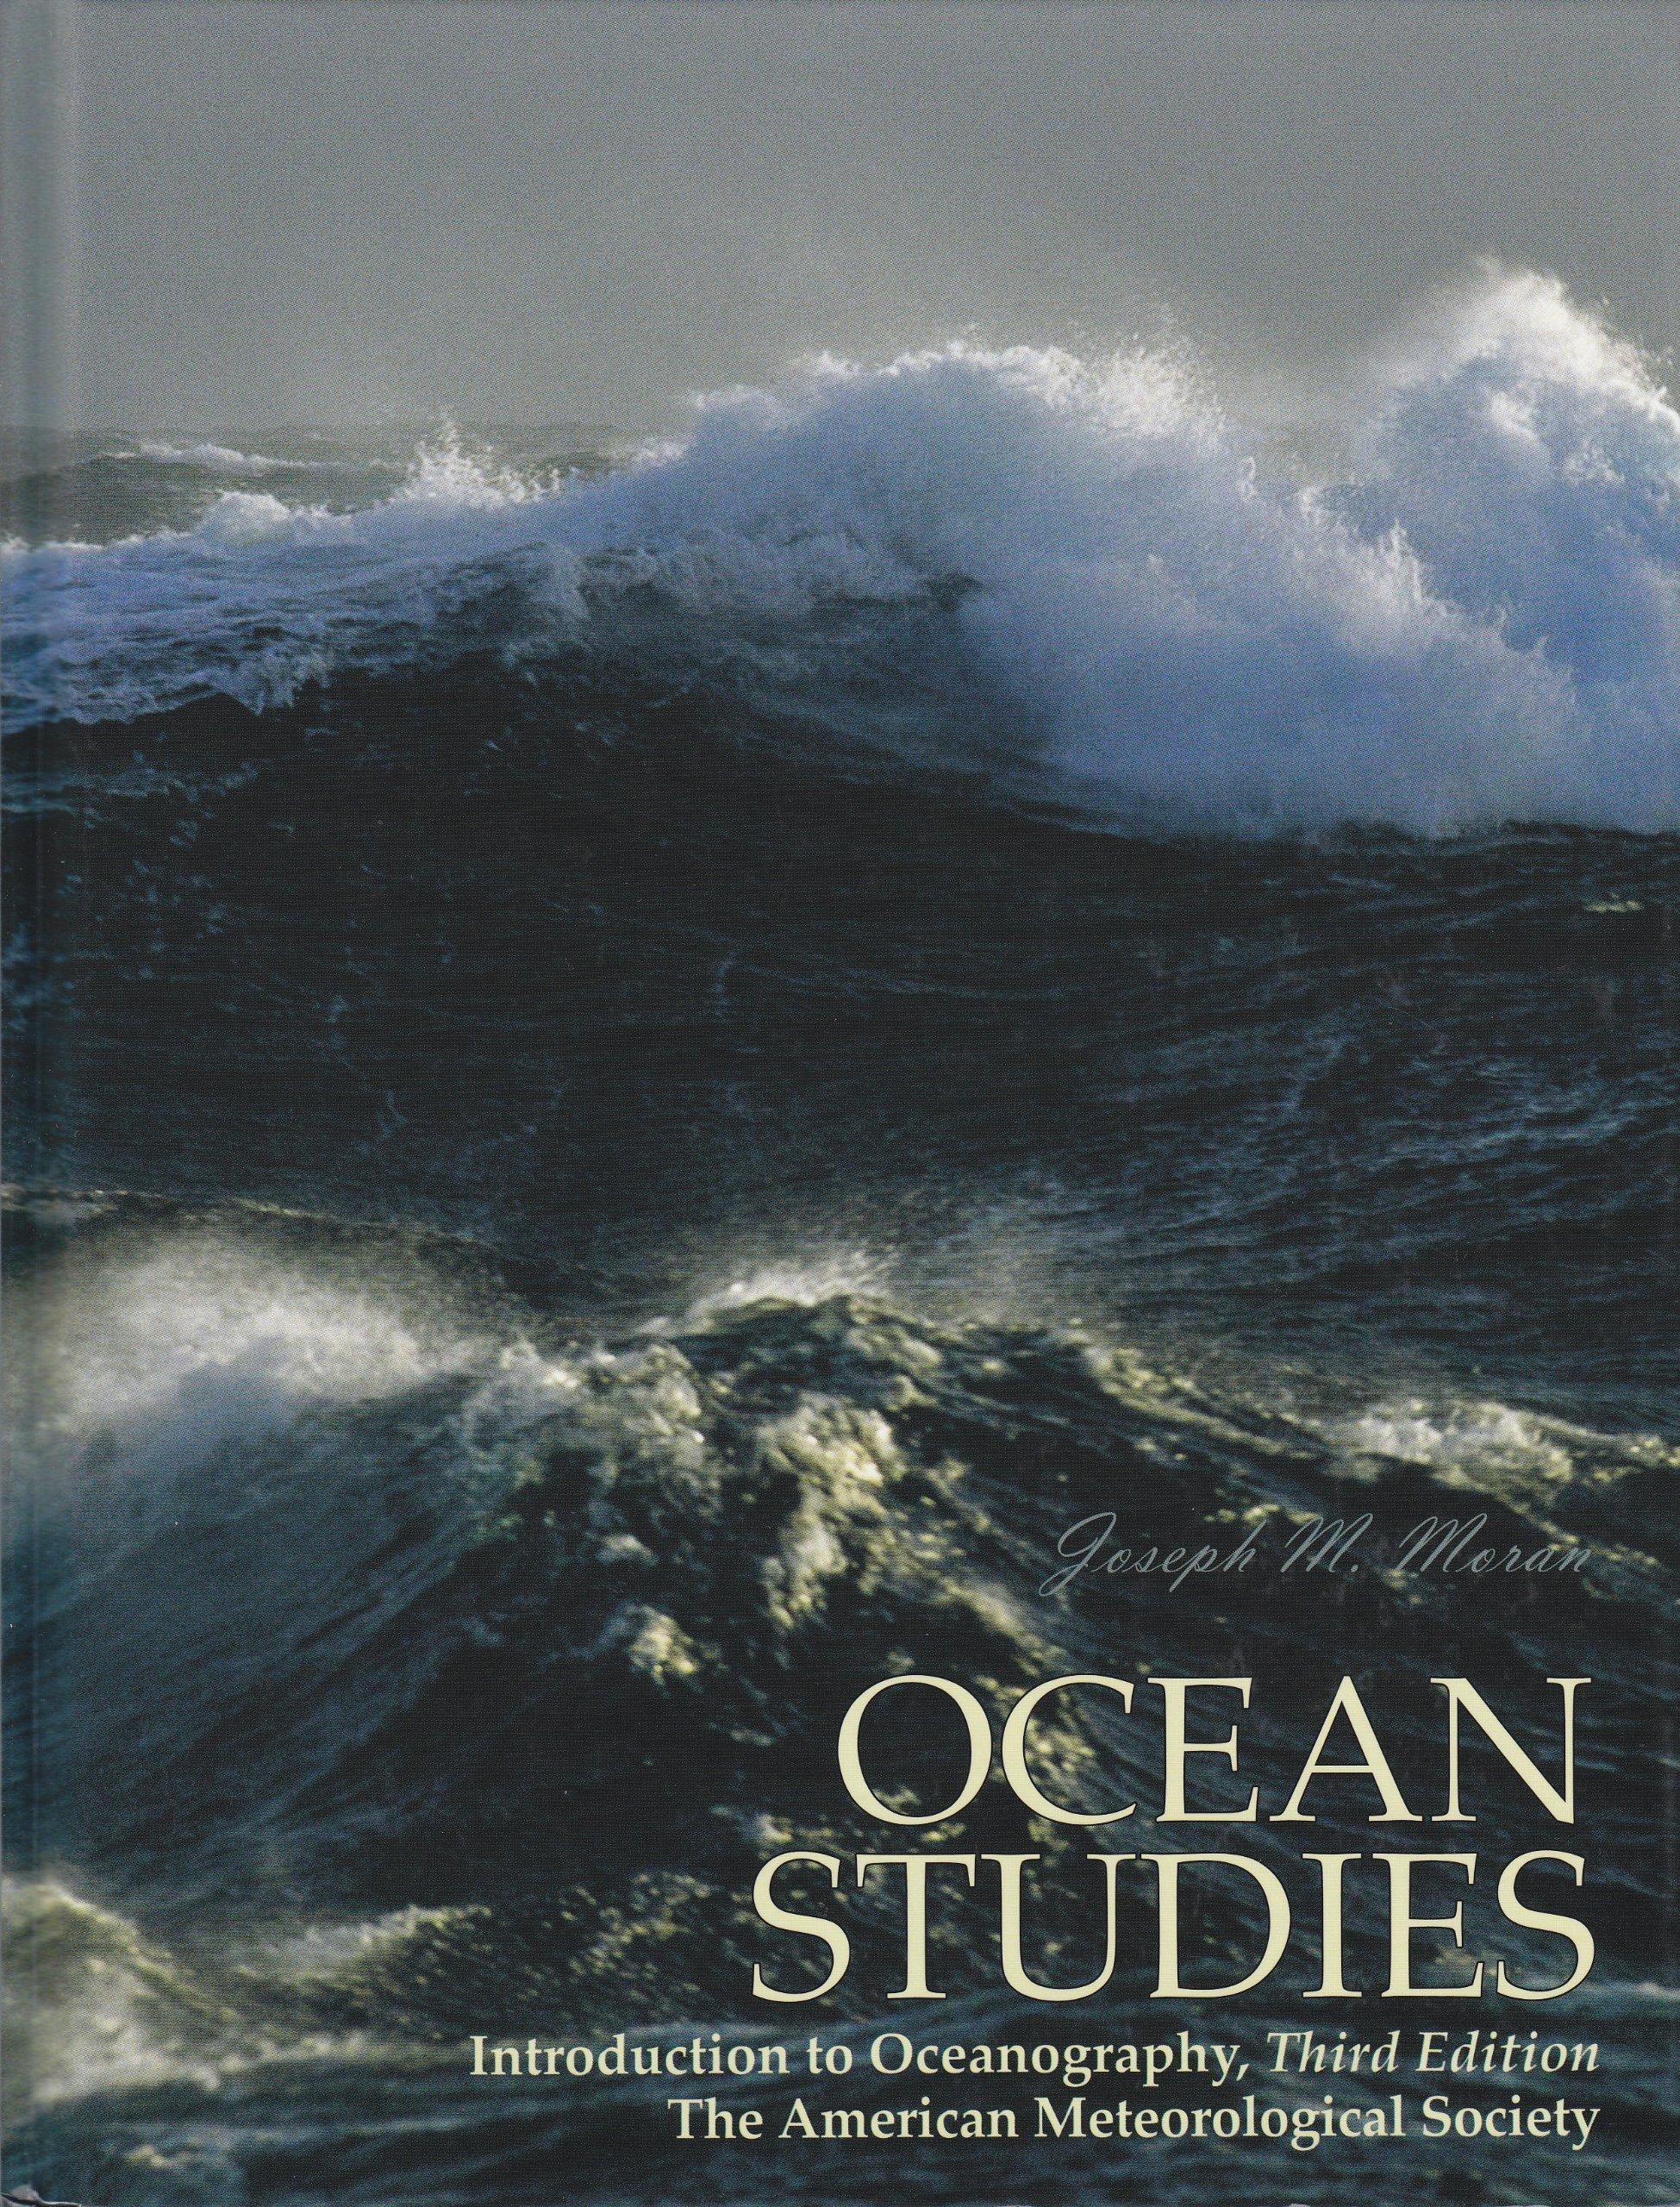 Ocean Studies: Introduction to Oceanography: Joseph M. Moran:  9781878220486: Amazon.com: Books